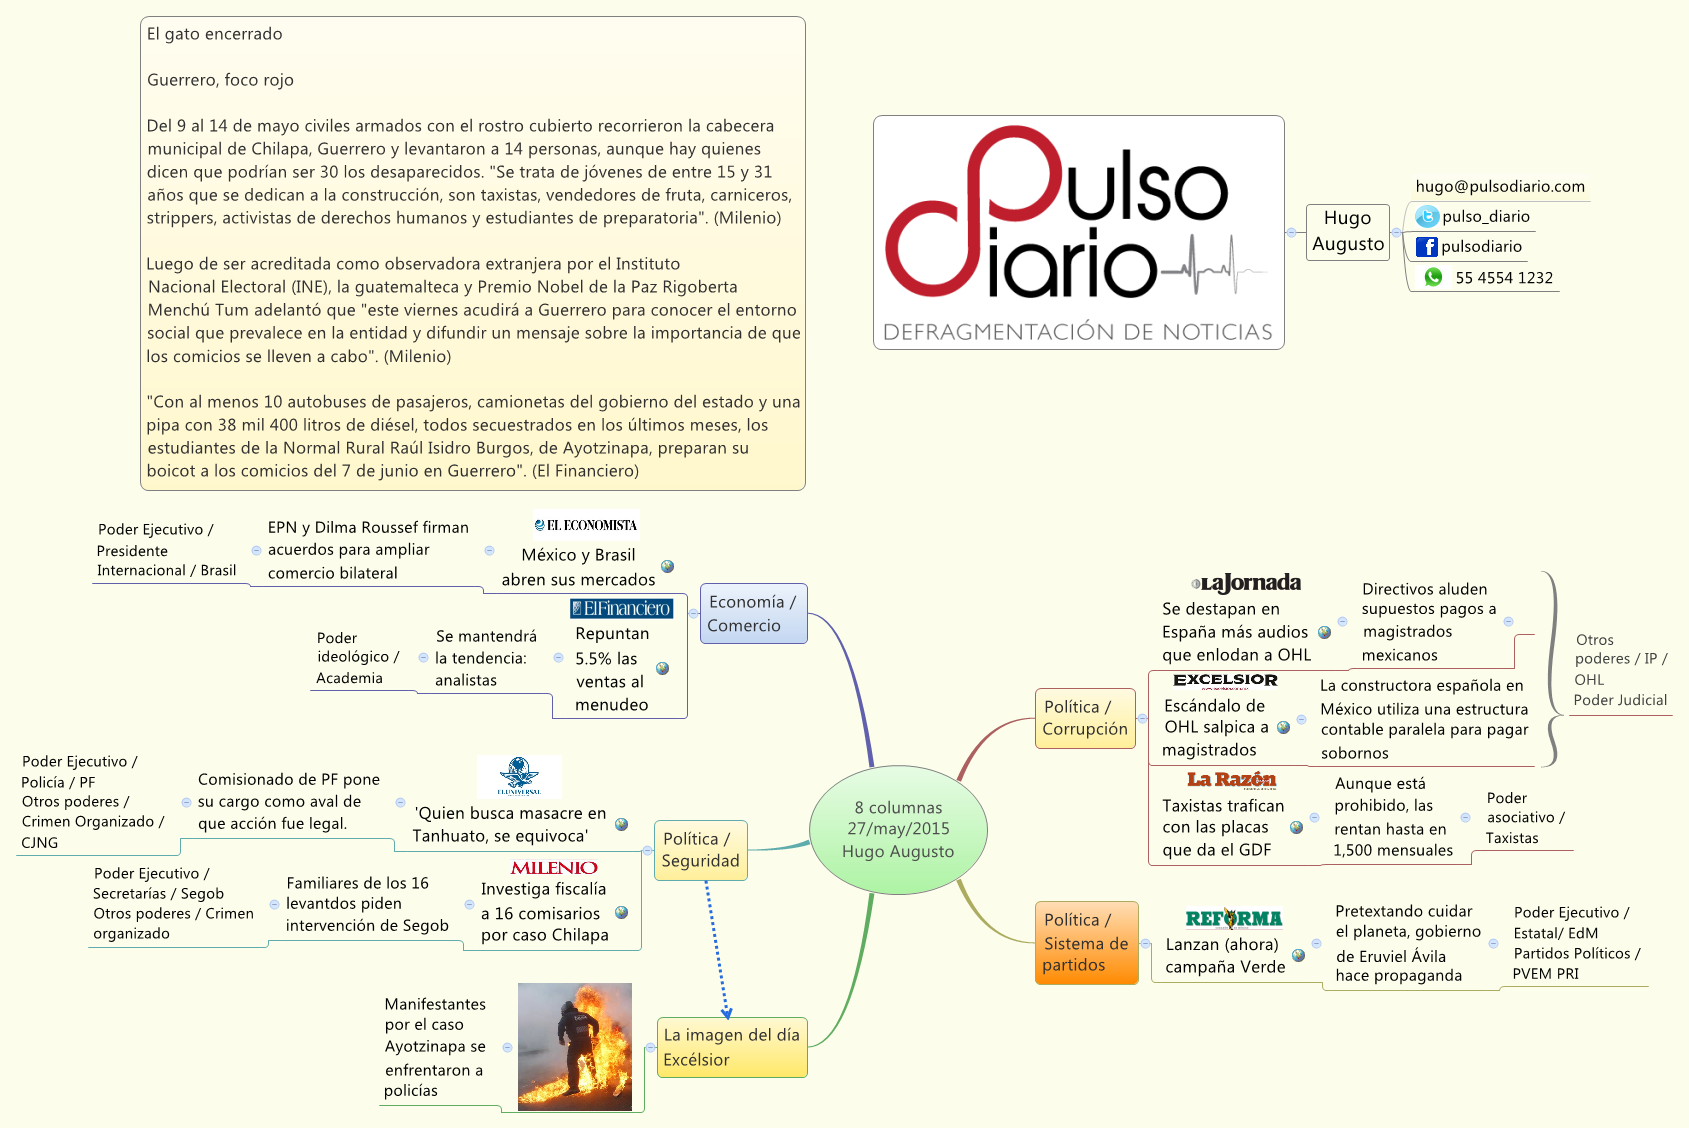 8 columnas 27/may/2015 Hugo Augusto - Hugo_Augusto - XMind: The Most ...